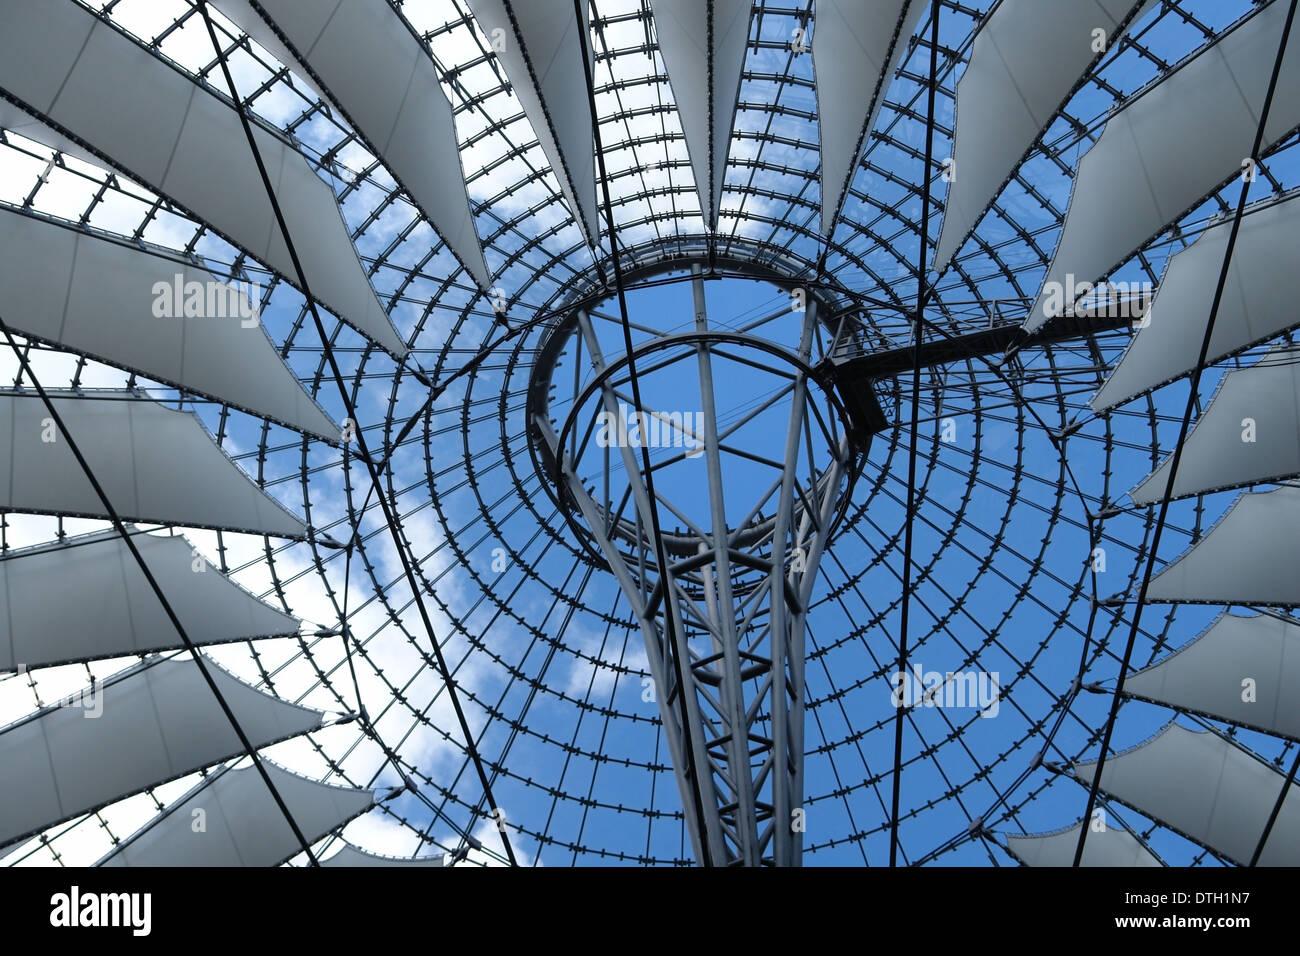 Detalle arquitectónico del Sony Center, en Potsdamer Platz en Berlín (Alemania) Imagen De Stock